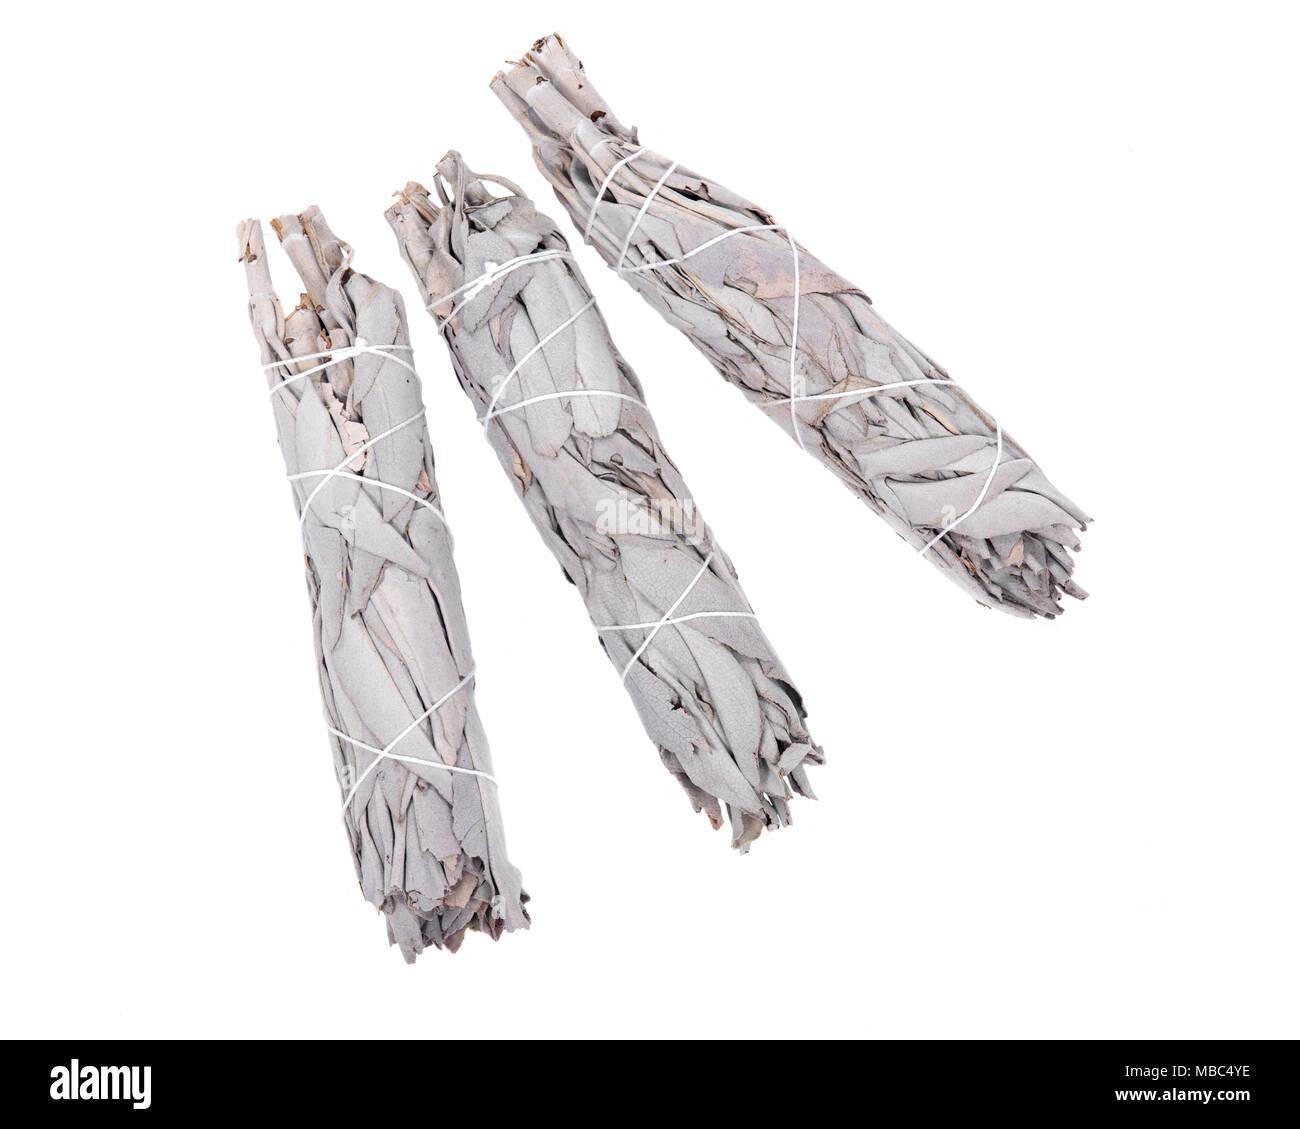 Sage smudge stick isolated on white background - Stock Image